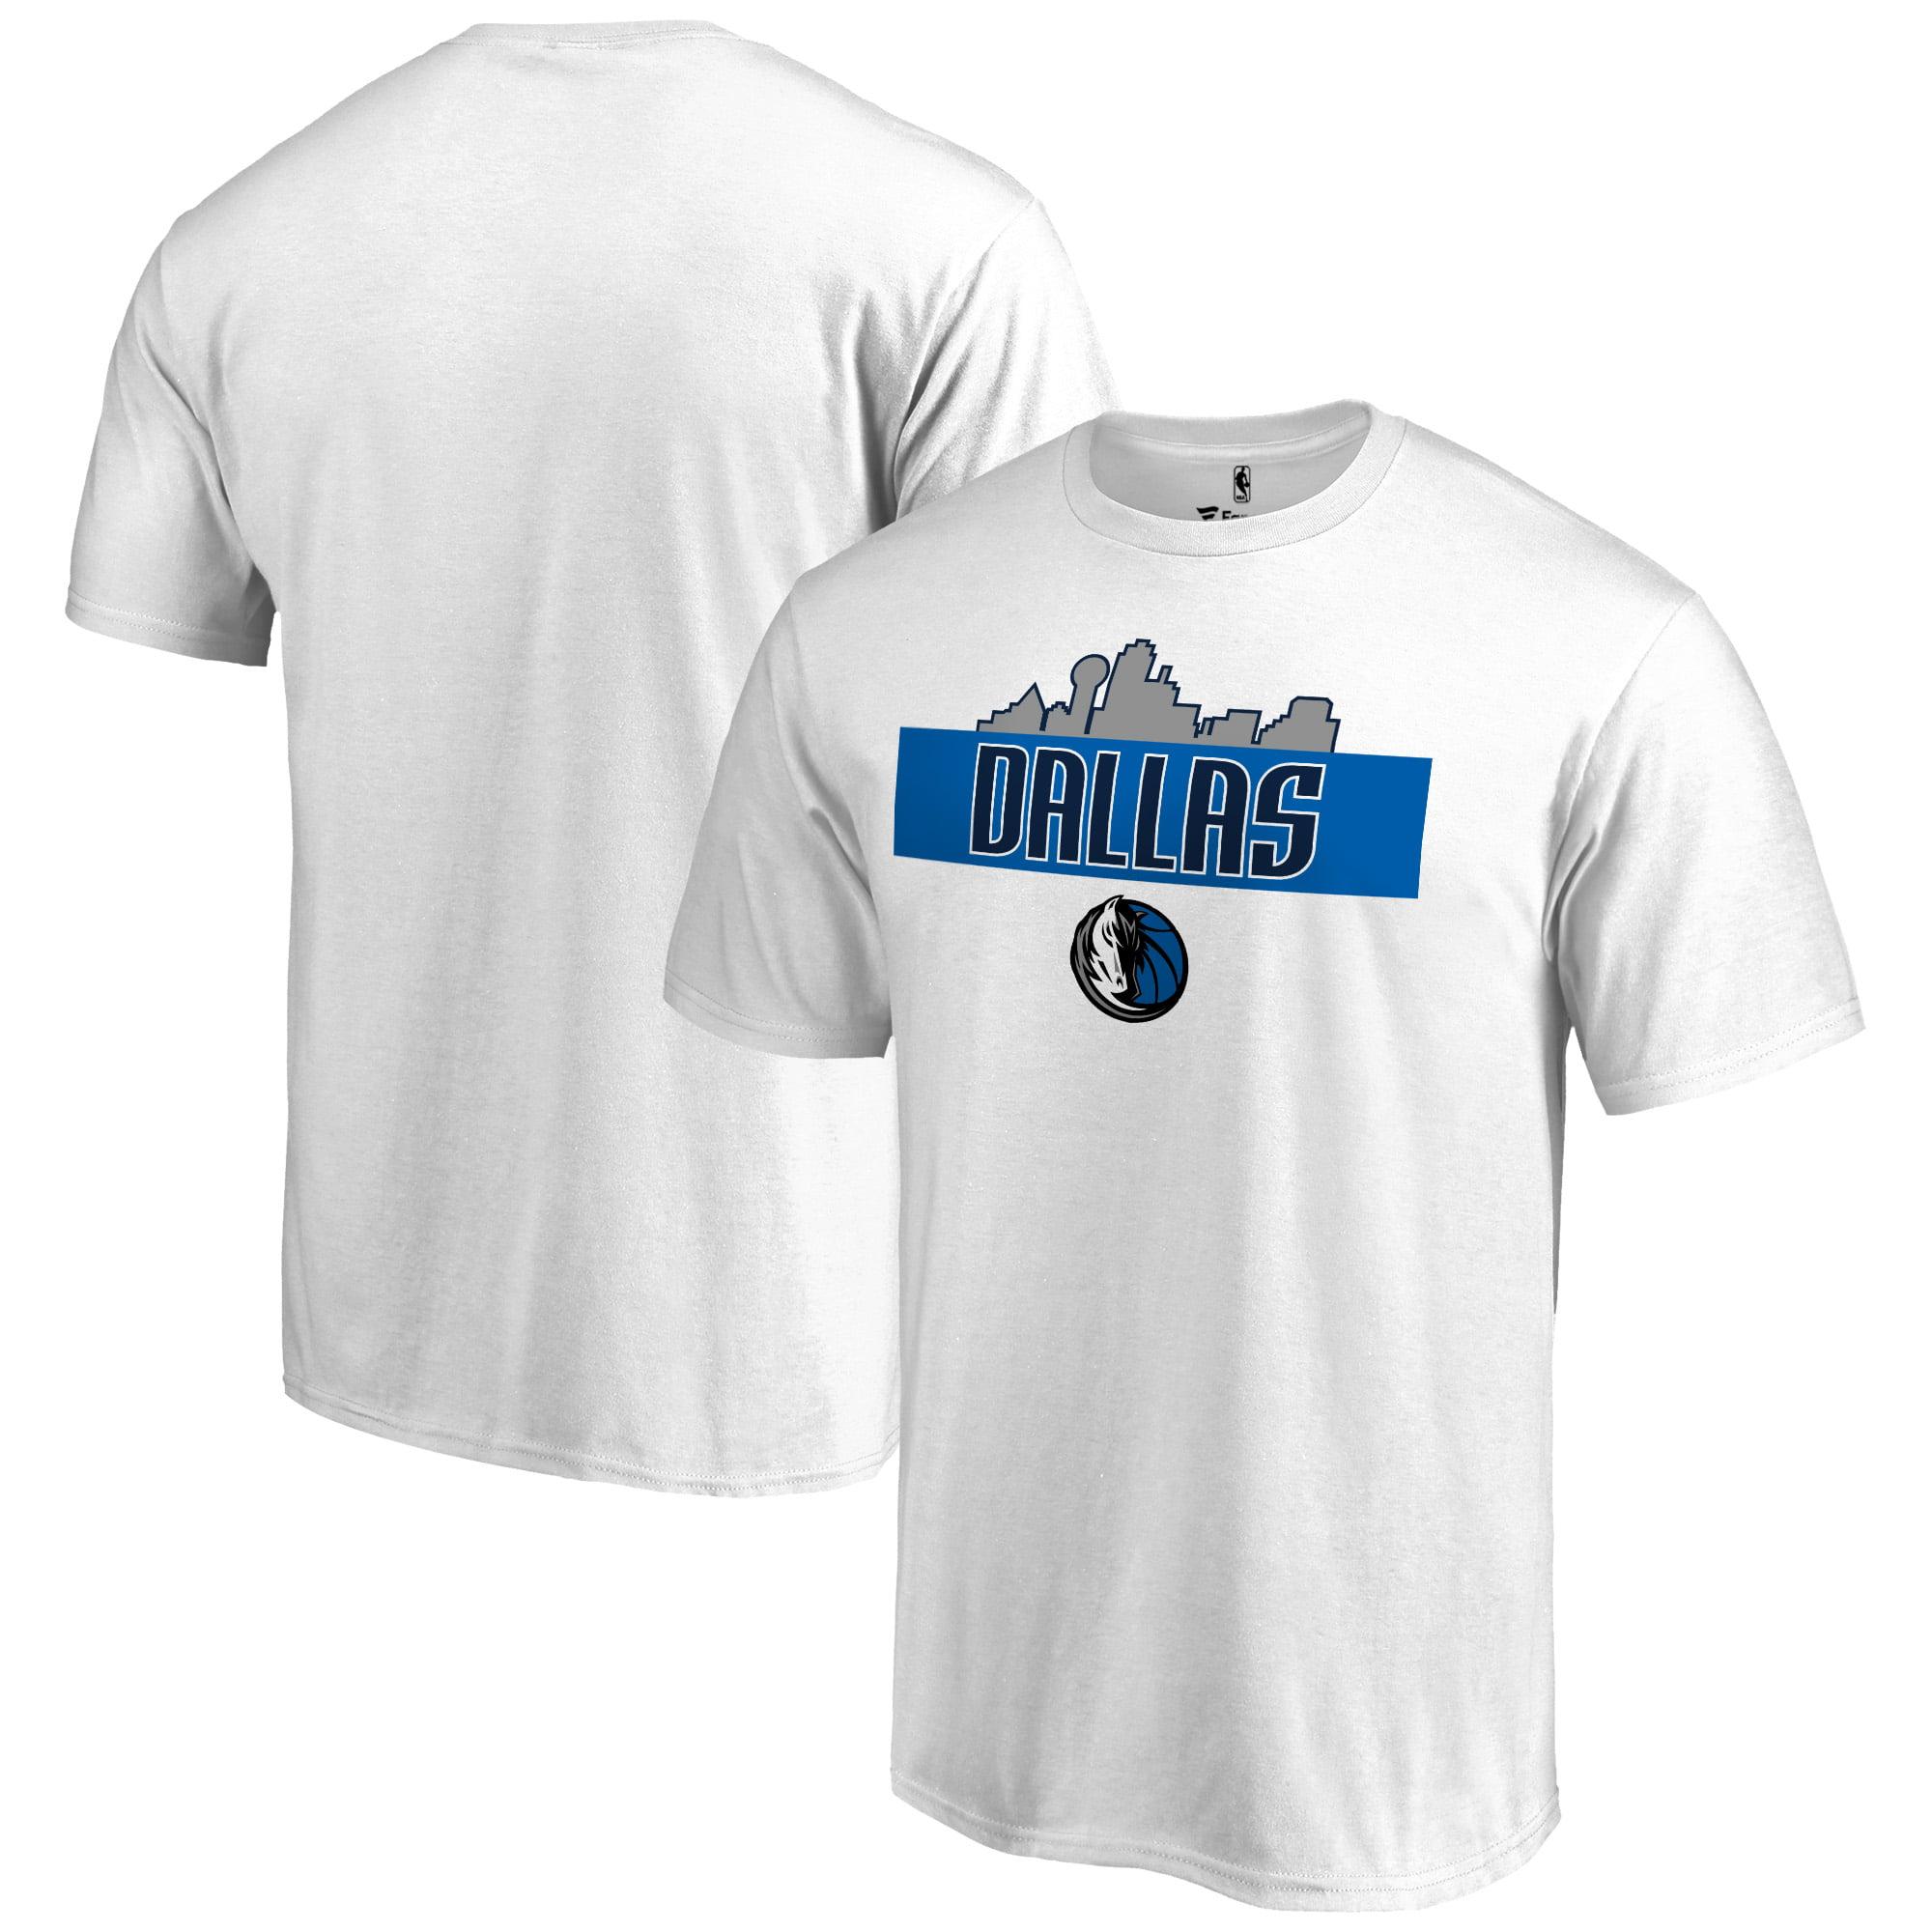 Dallas Mavericks Hometown Collection Skyline T-Shirt - White